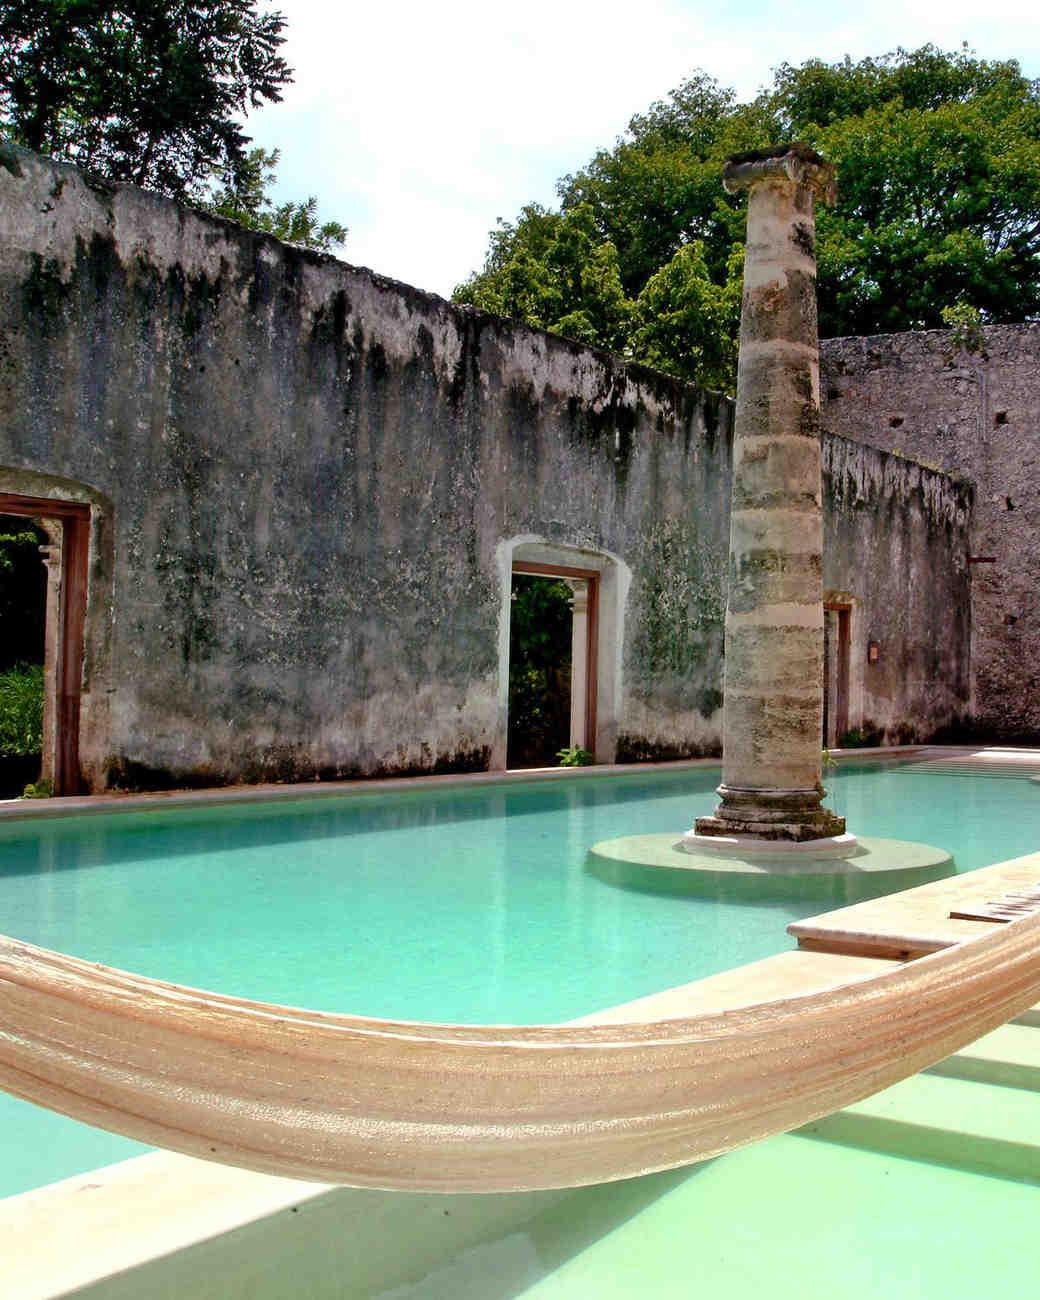 hacienda-uayamon-mexico-mwd1011mmsmith.jpg